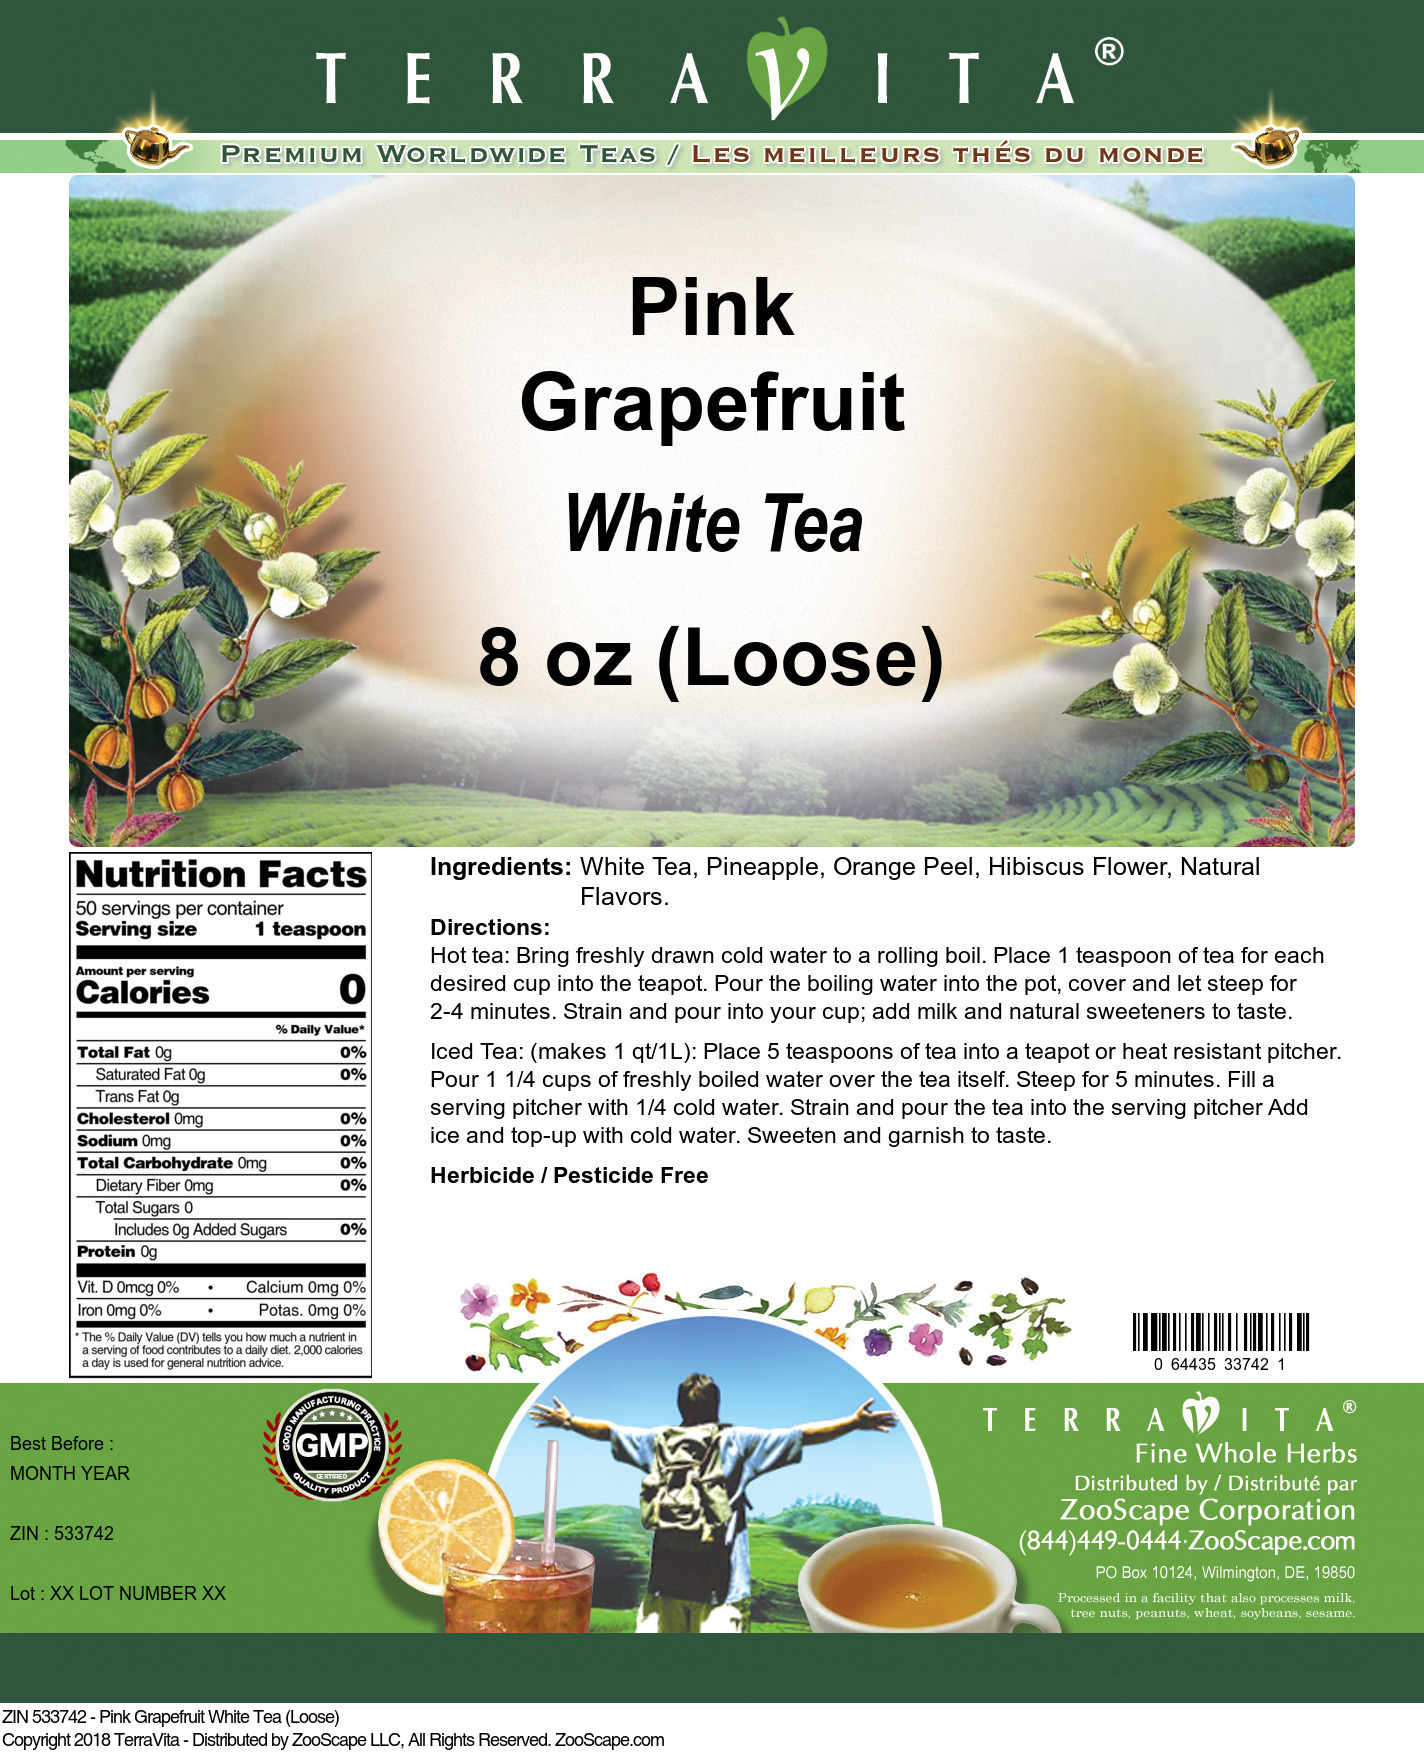 Pink Grapefruit White Tea